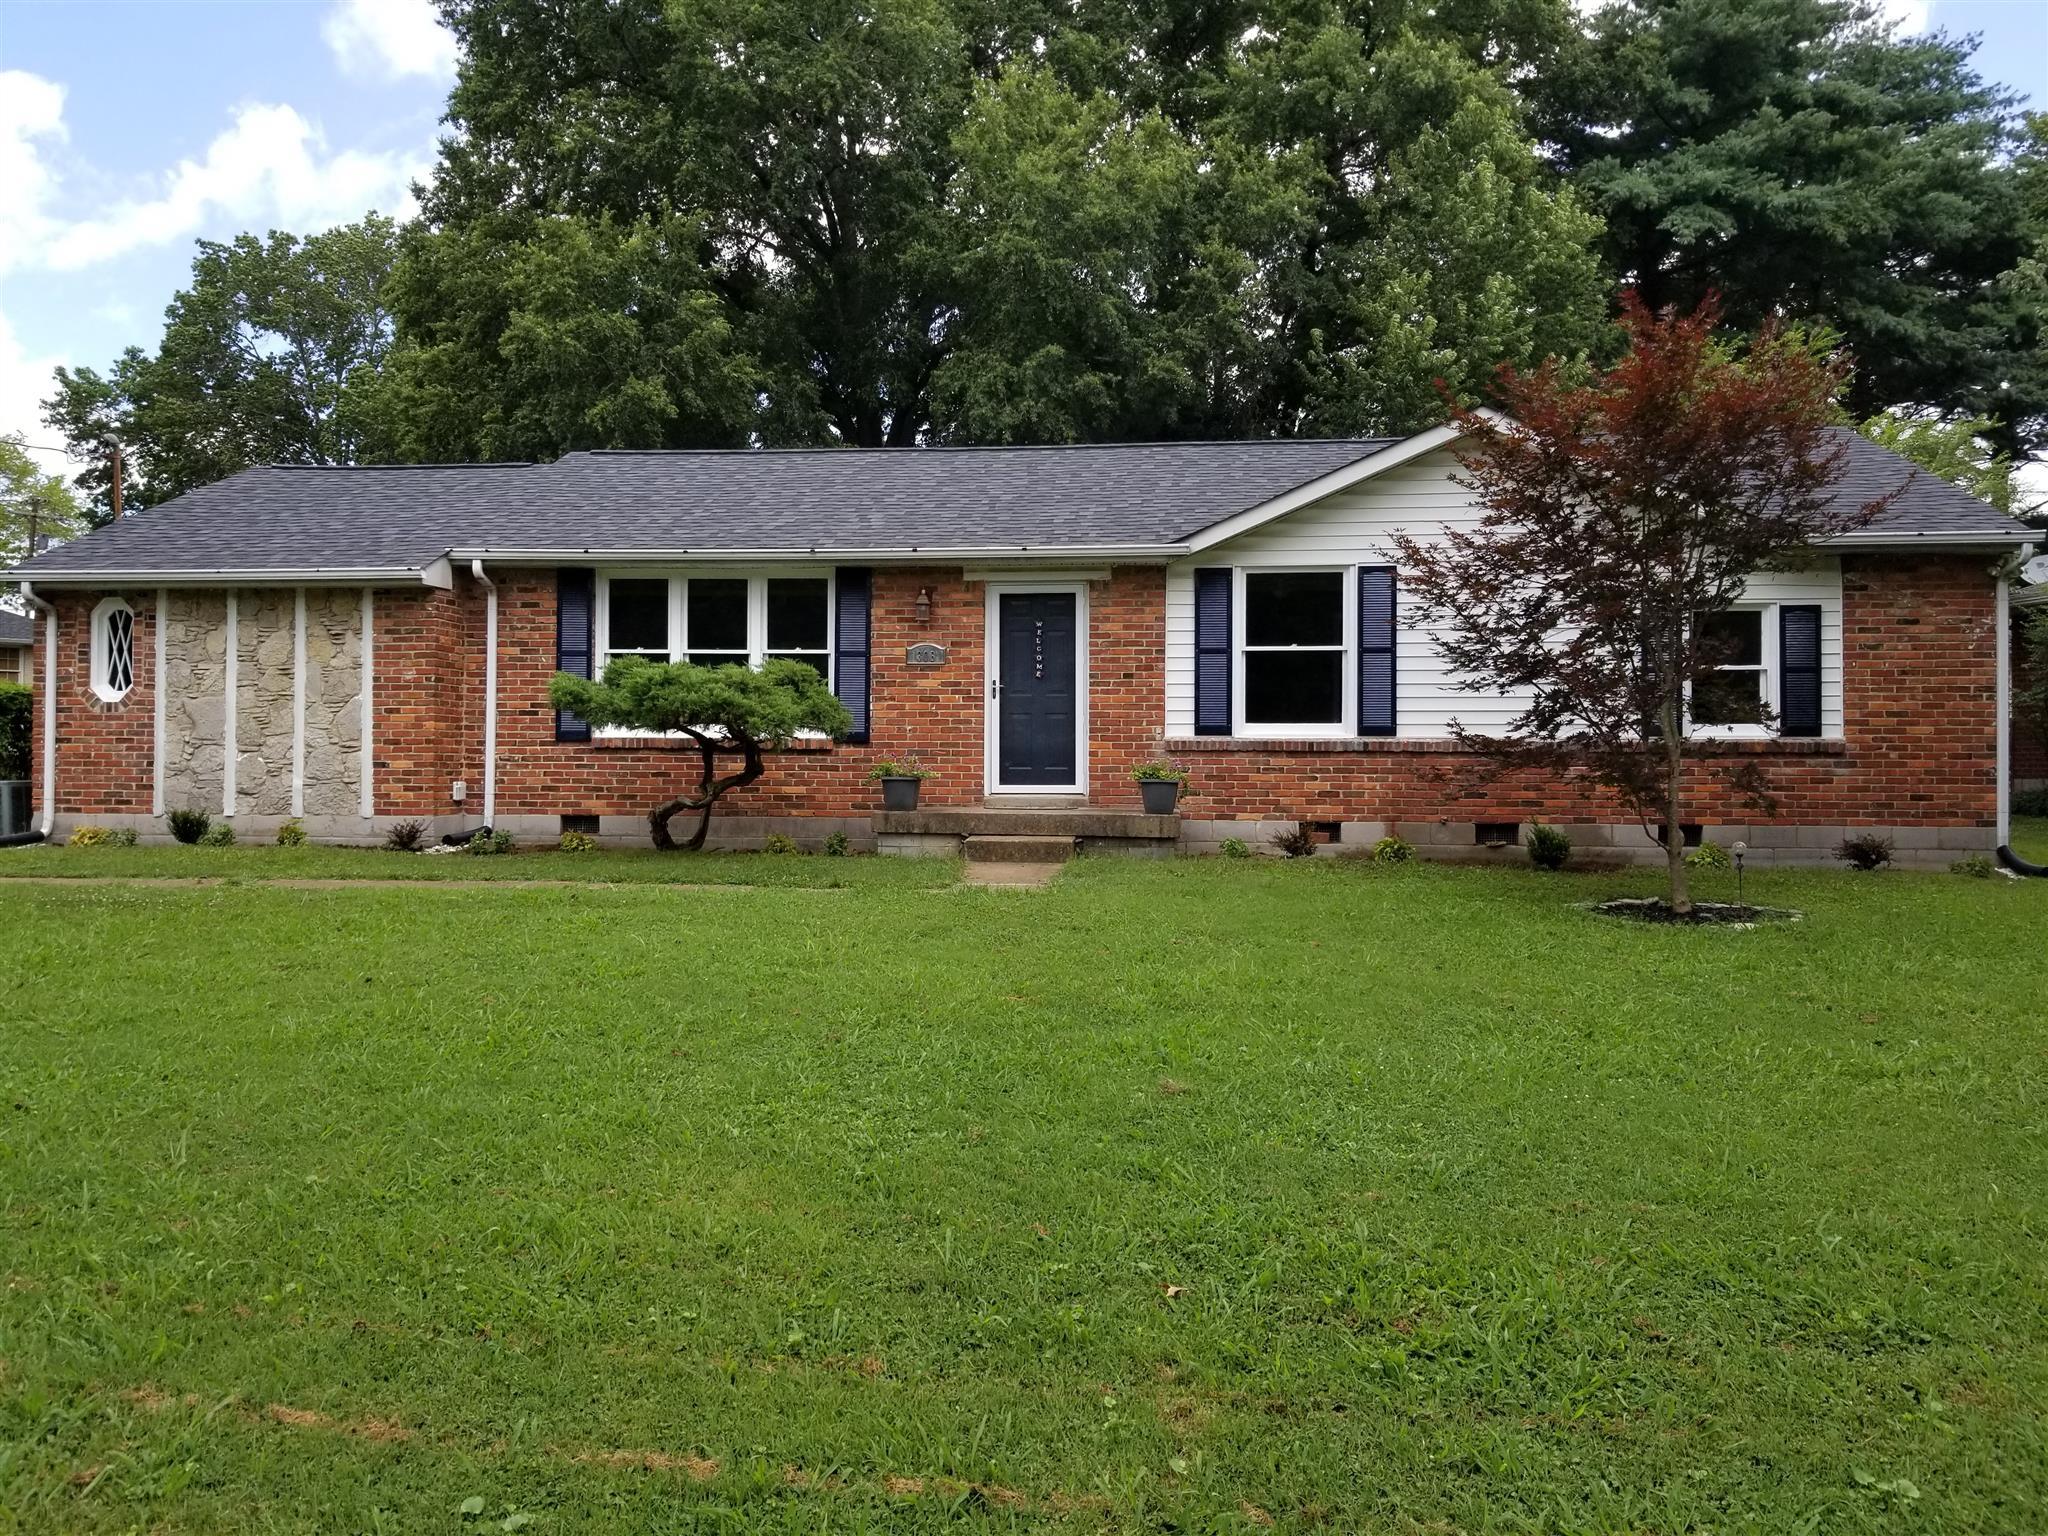 306 Edgeview Dr, Nashville, TN 37211 - Nashville, TN real estate listing